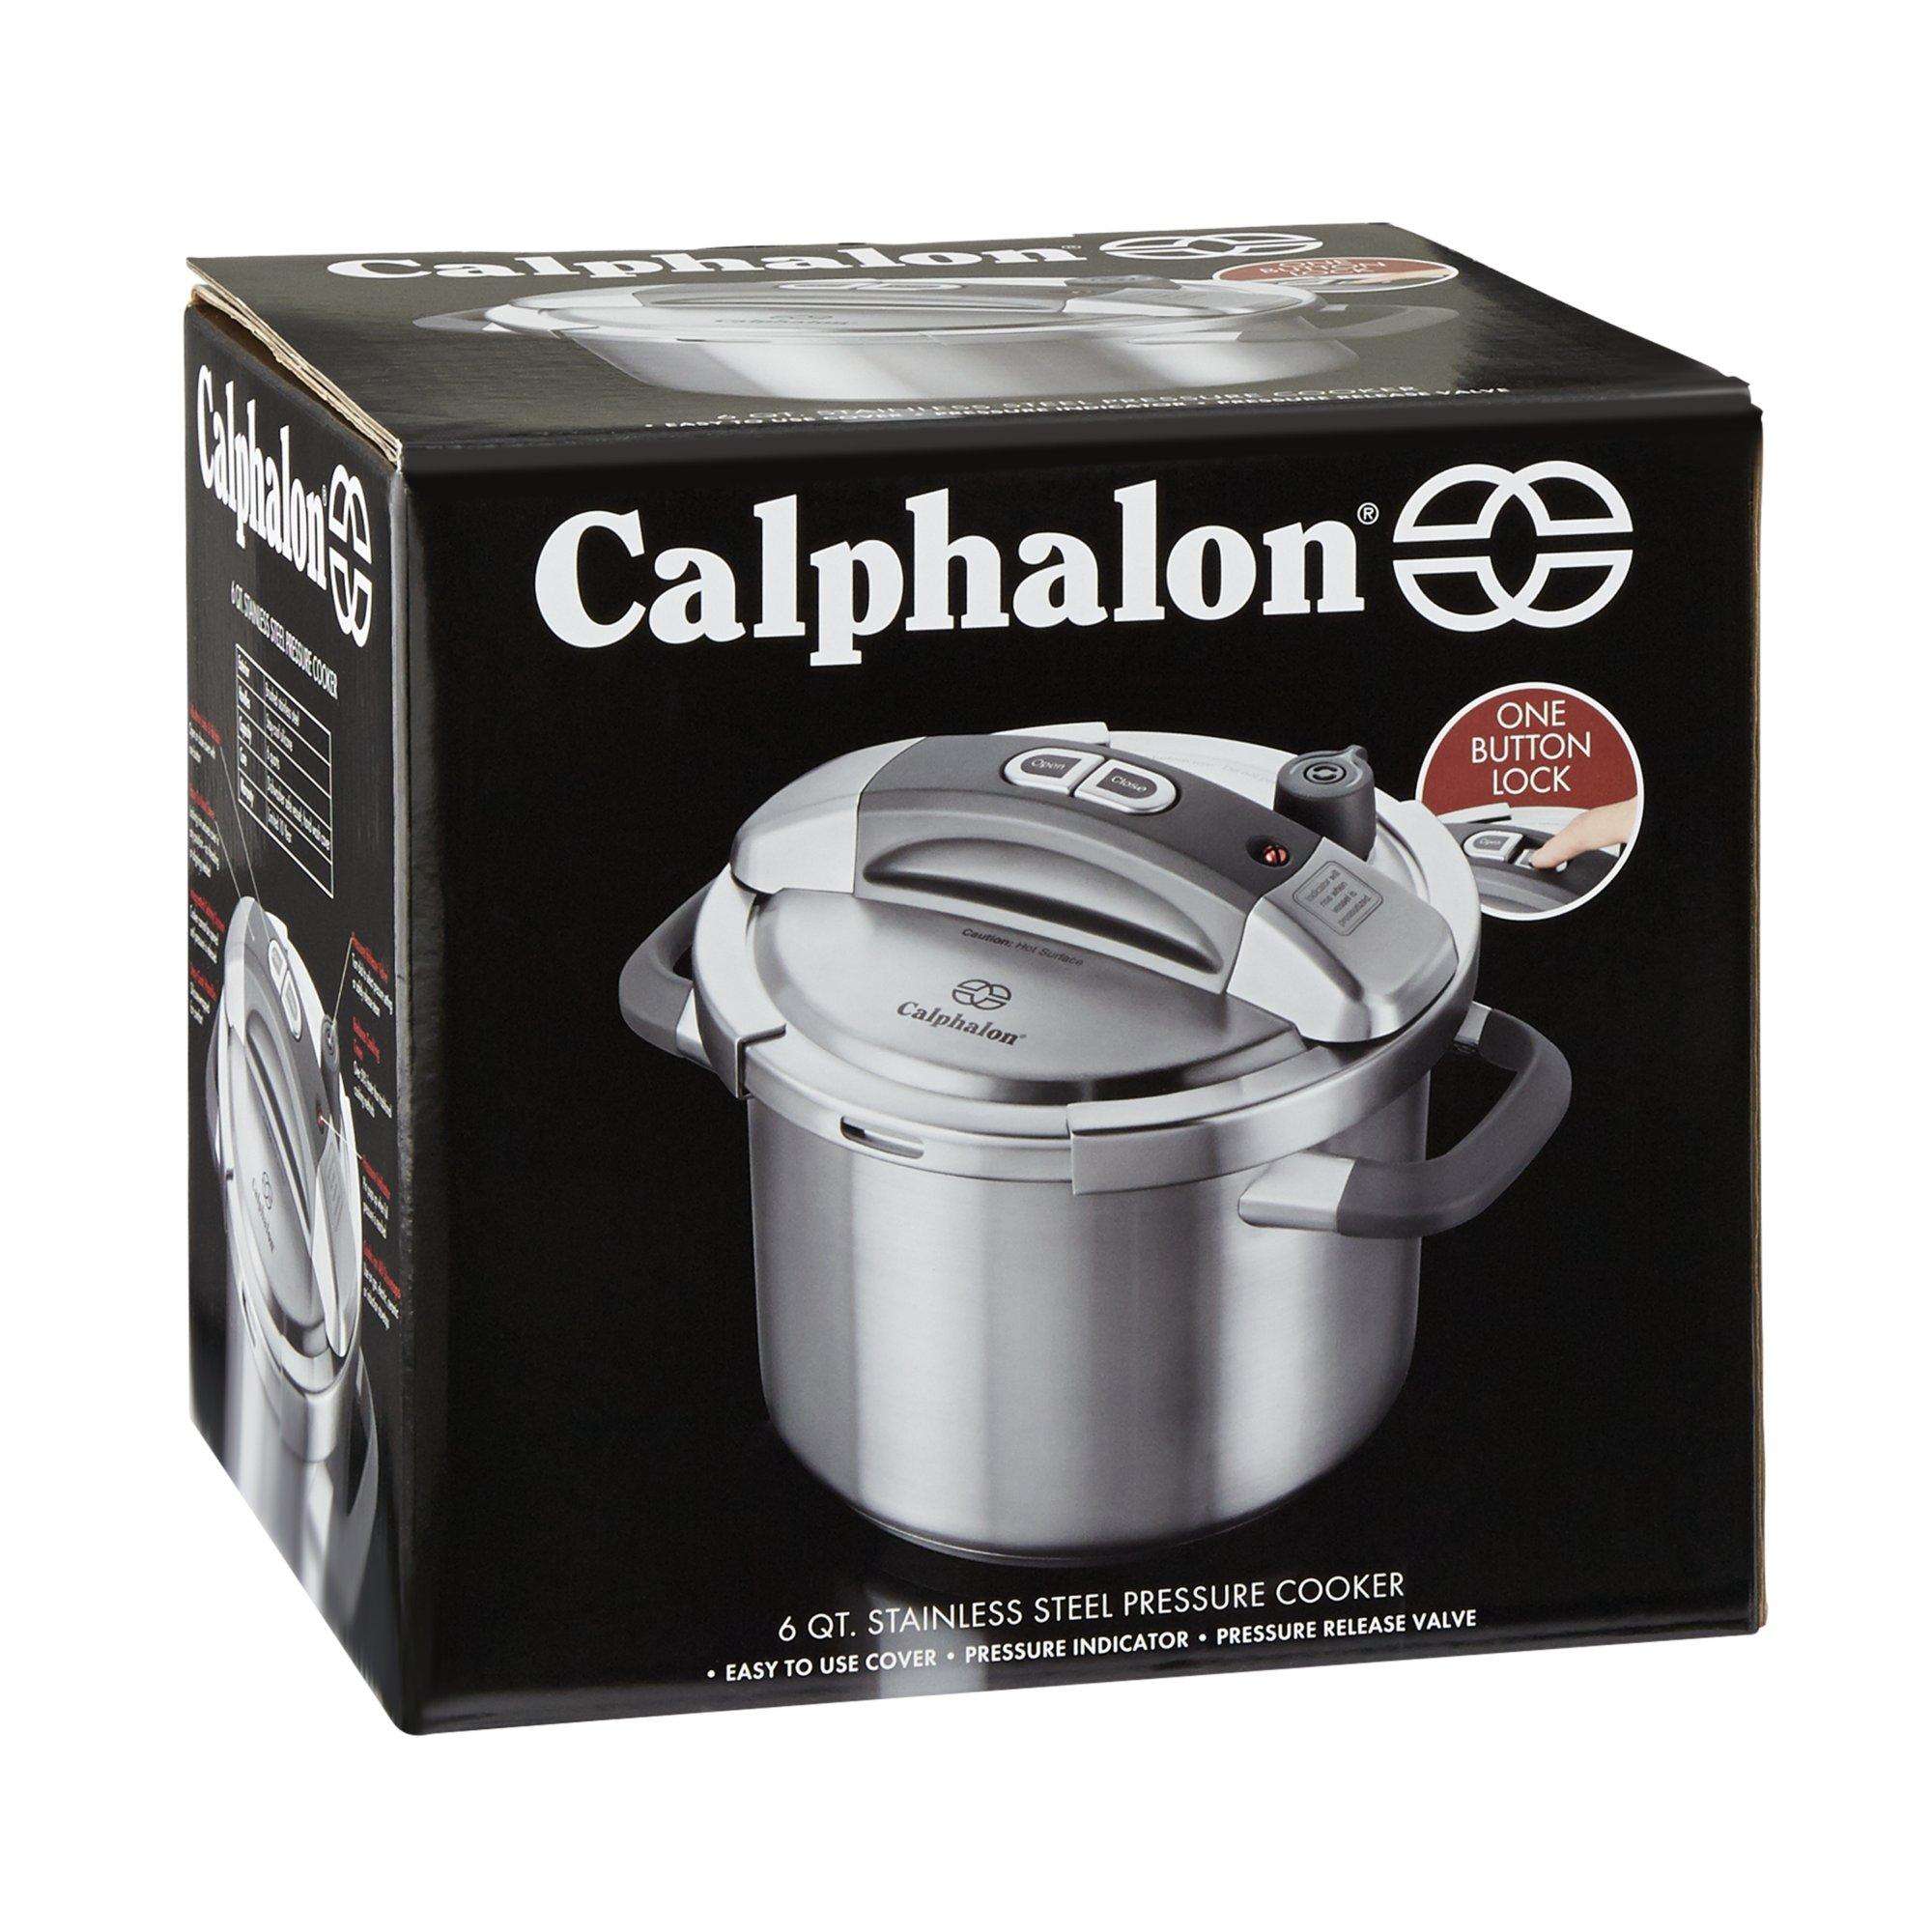 Calphalon 6 Qt. Stainless Steel Pressure Cooker